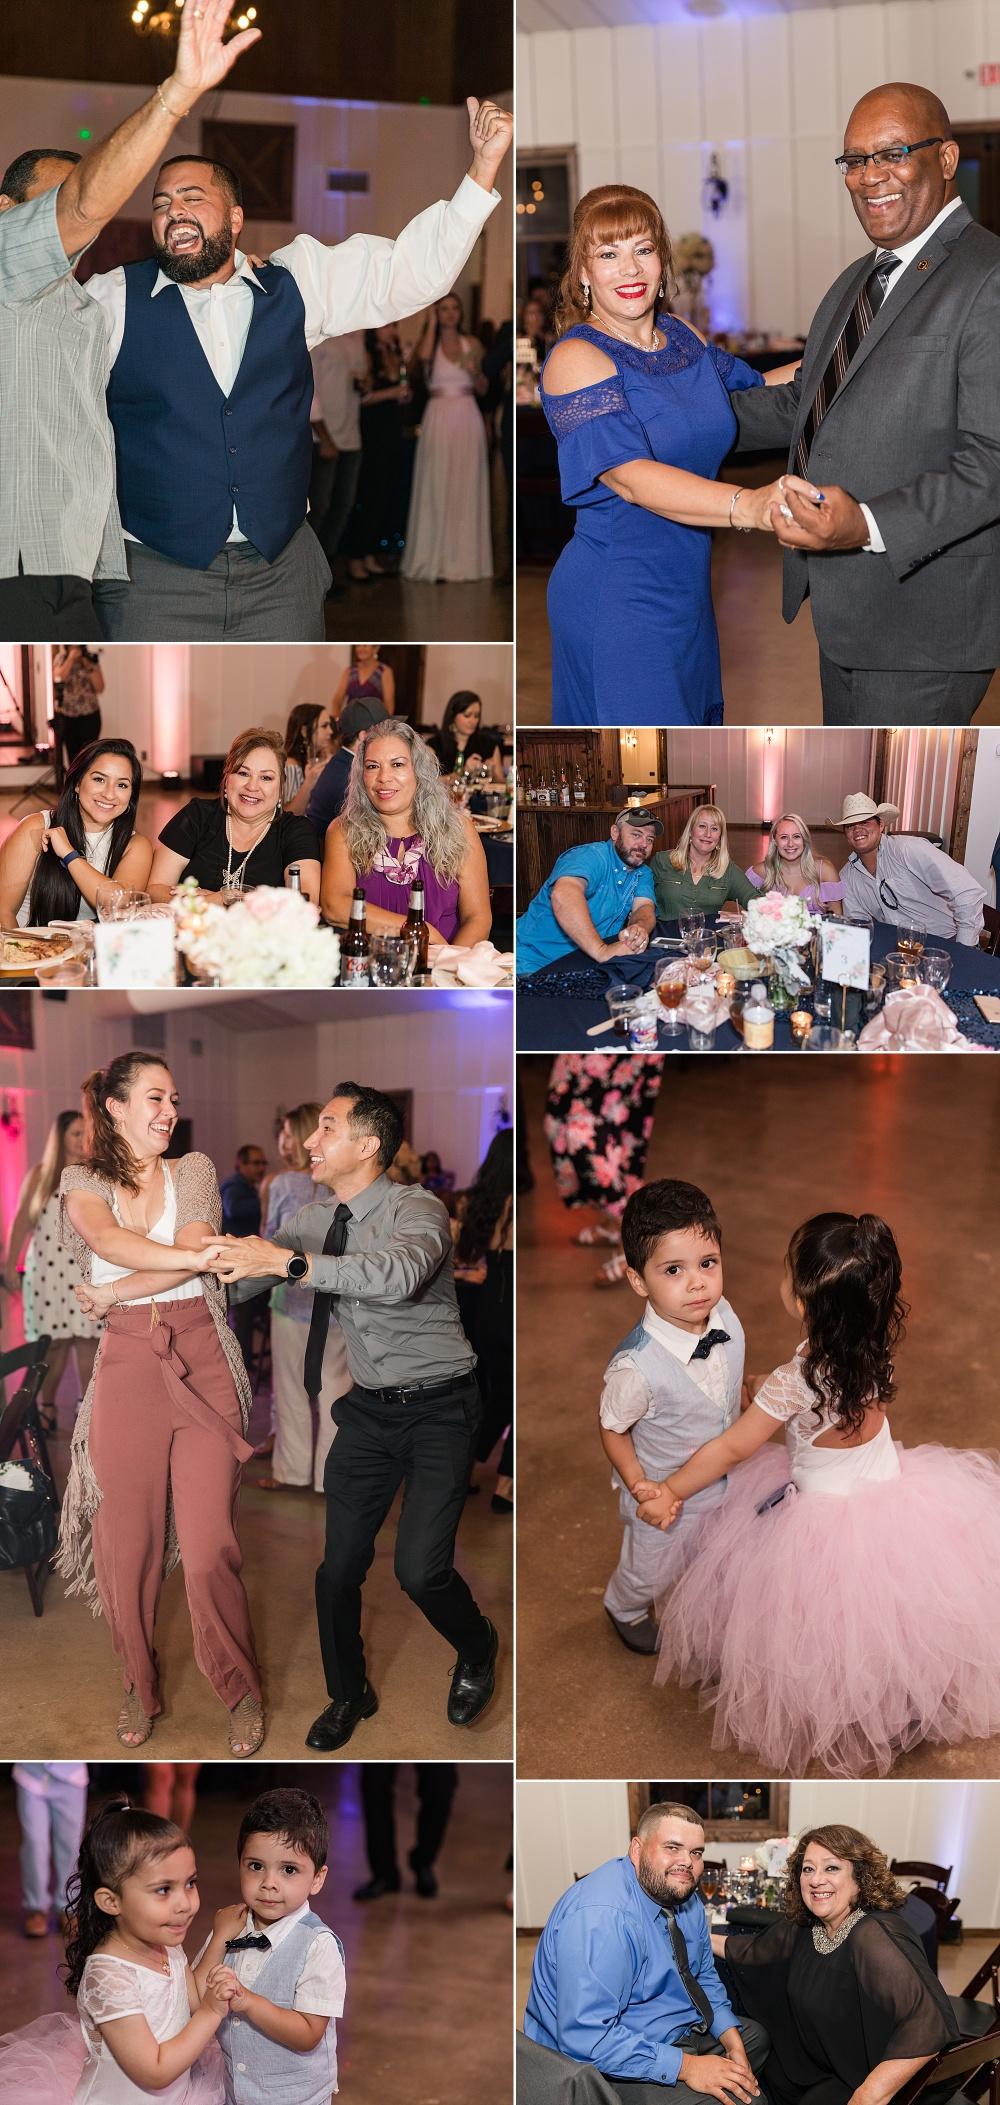 Wedding-Photographer-Bulverde-Texas-Western-Sky-Event-Venue-Carly-Barton-Photography_0078.jpg